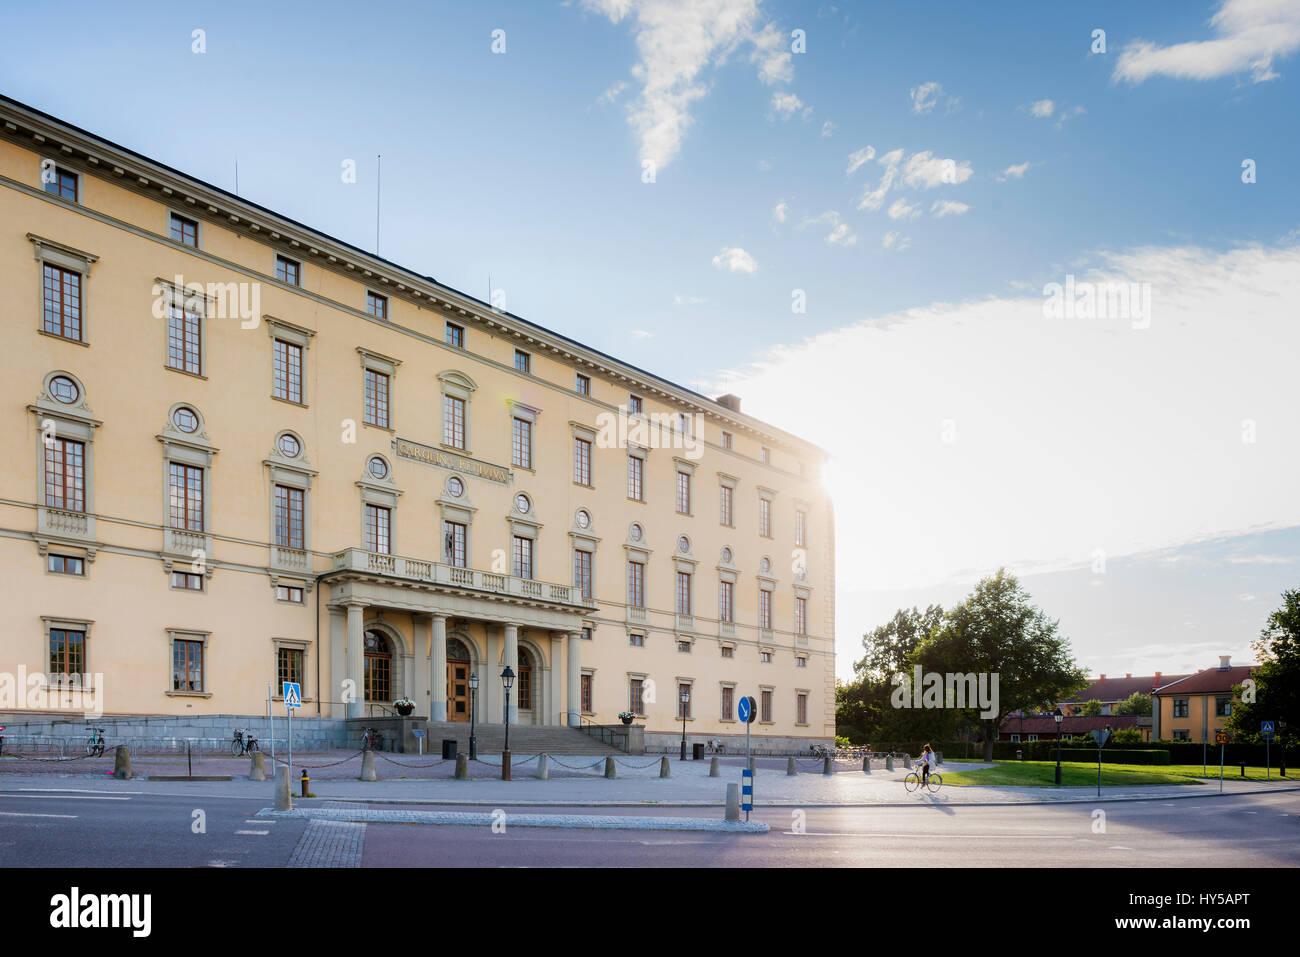 Sweden, Uppland, Uppsala, Building of University Library Stock Photo